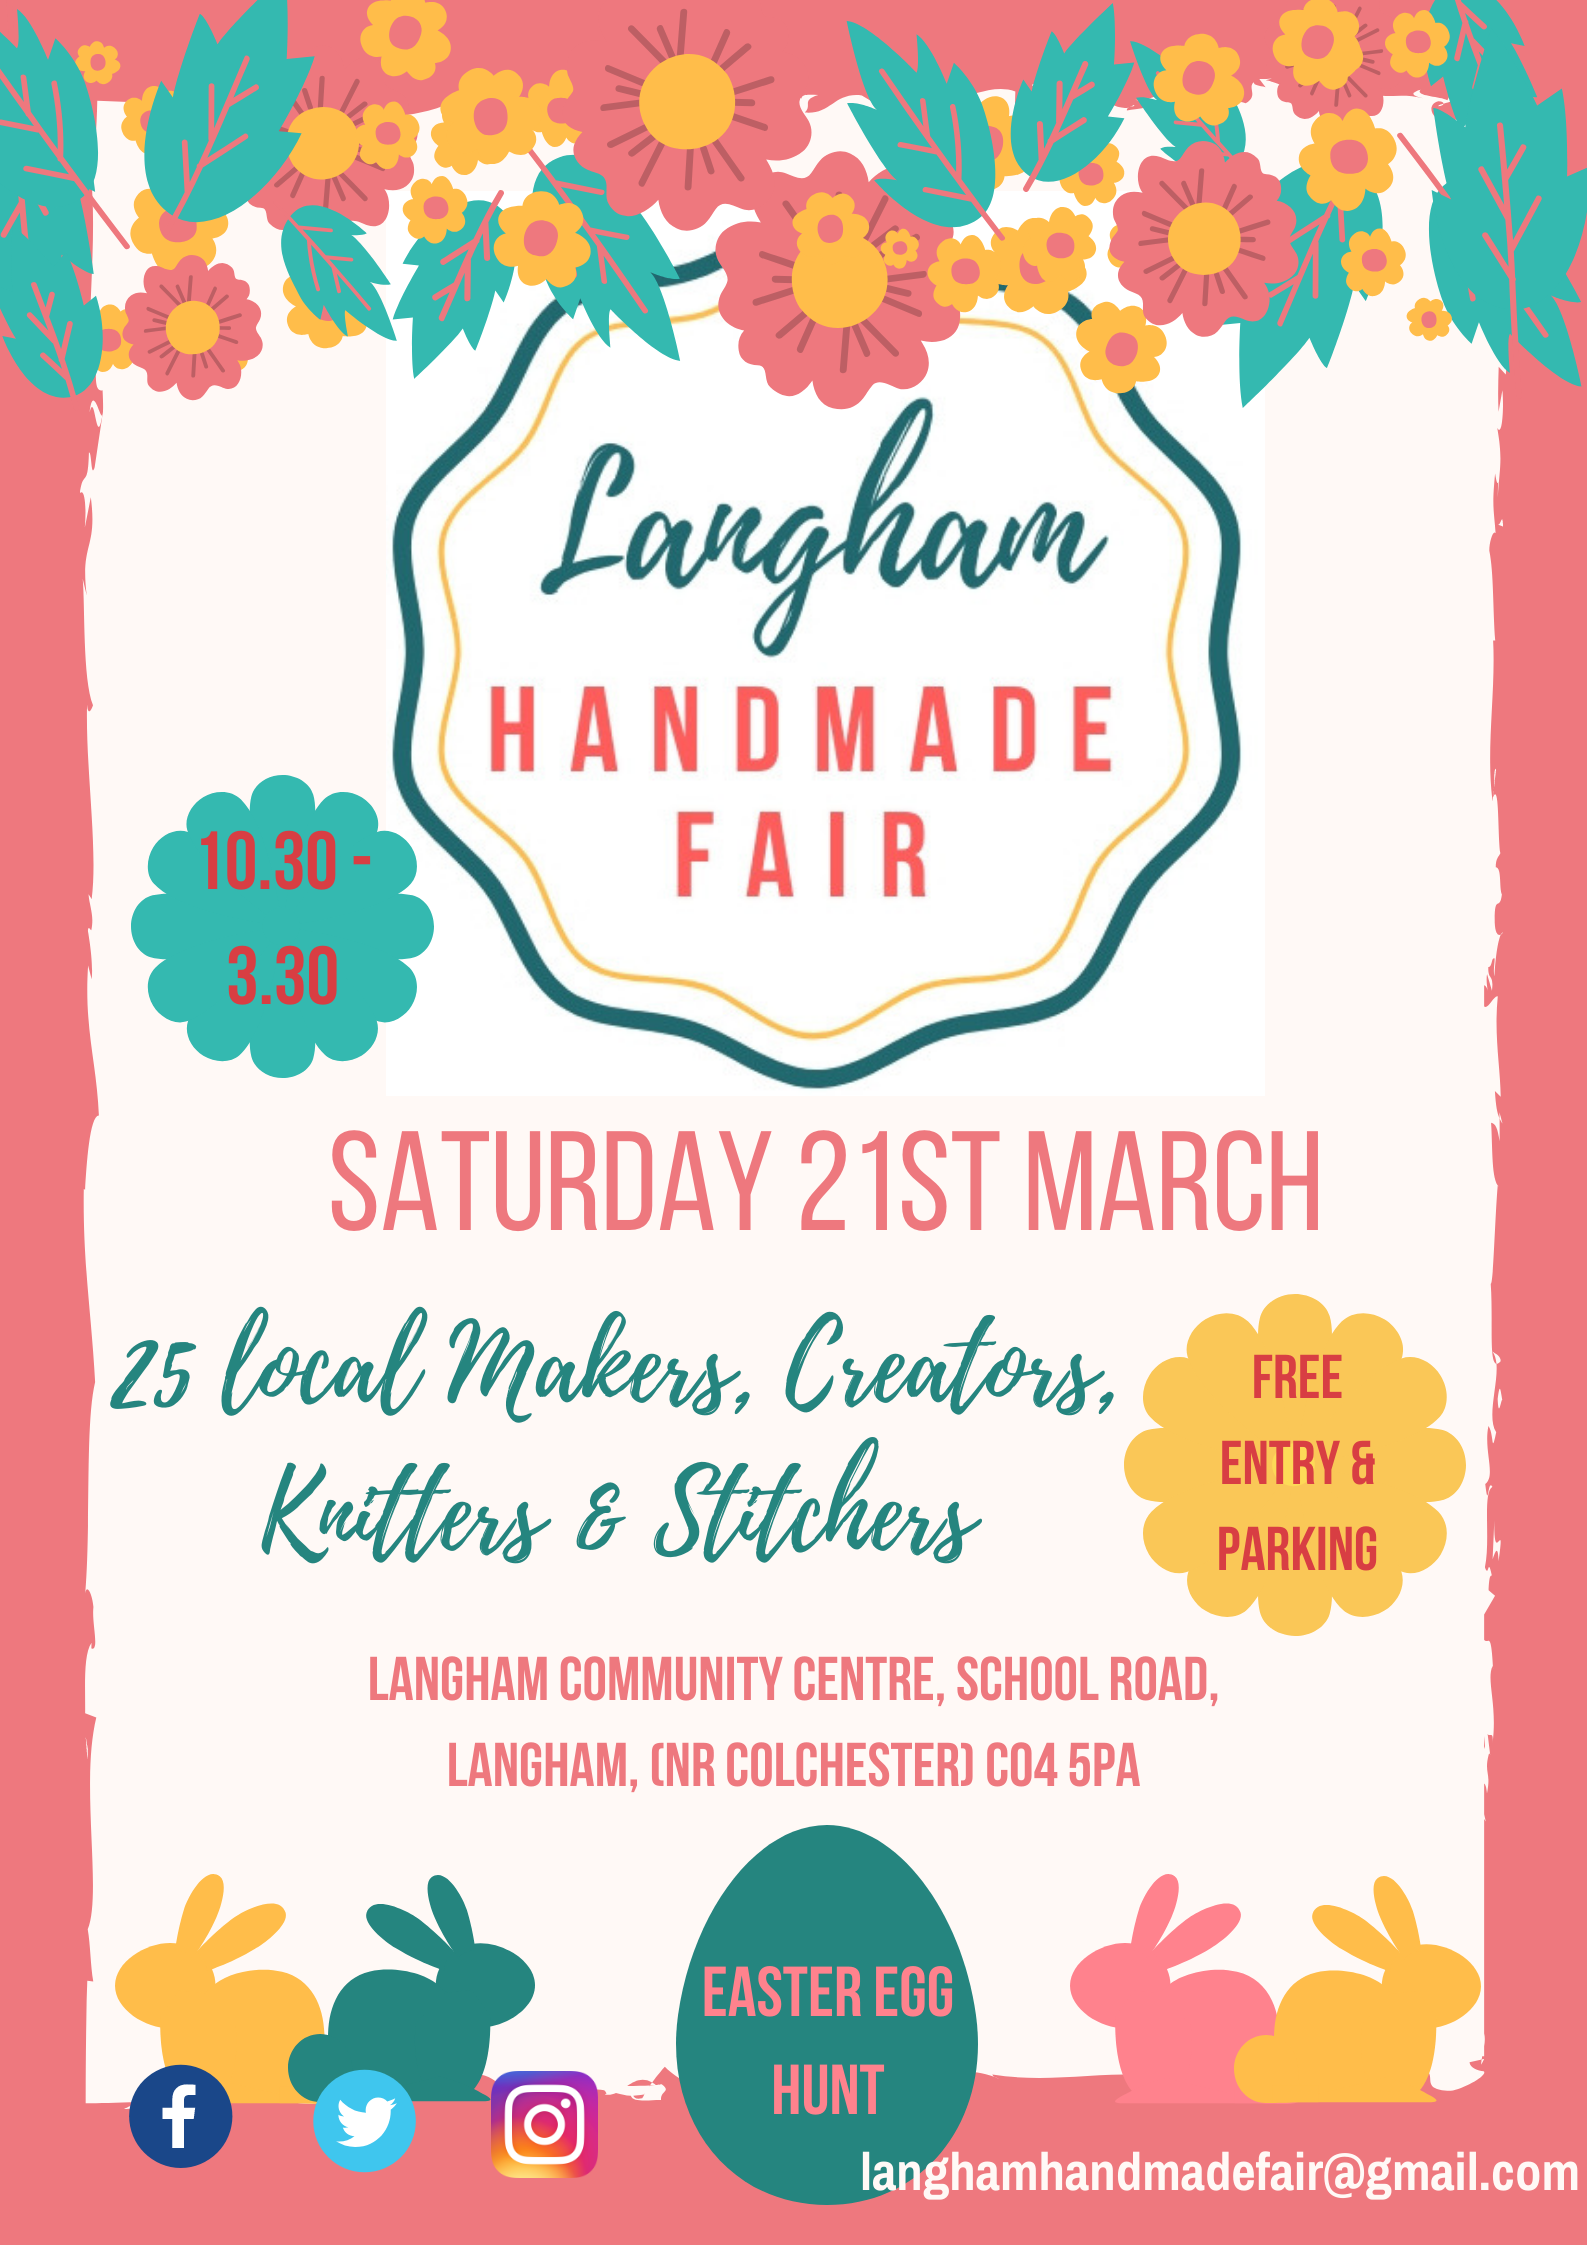 Langham Handmade Fair Saturday 21st March 10.30 - 3.30, Langham Community Centre